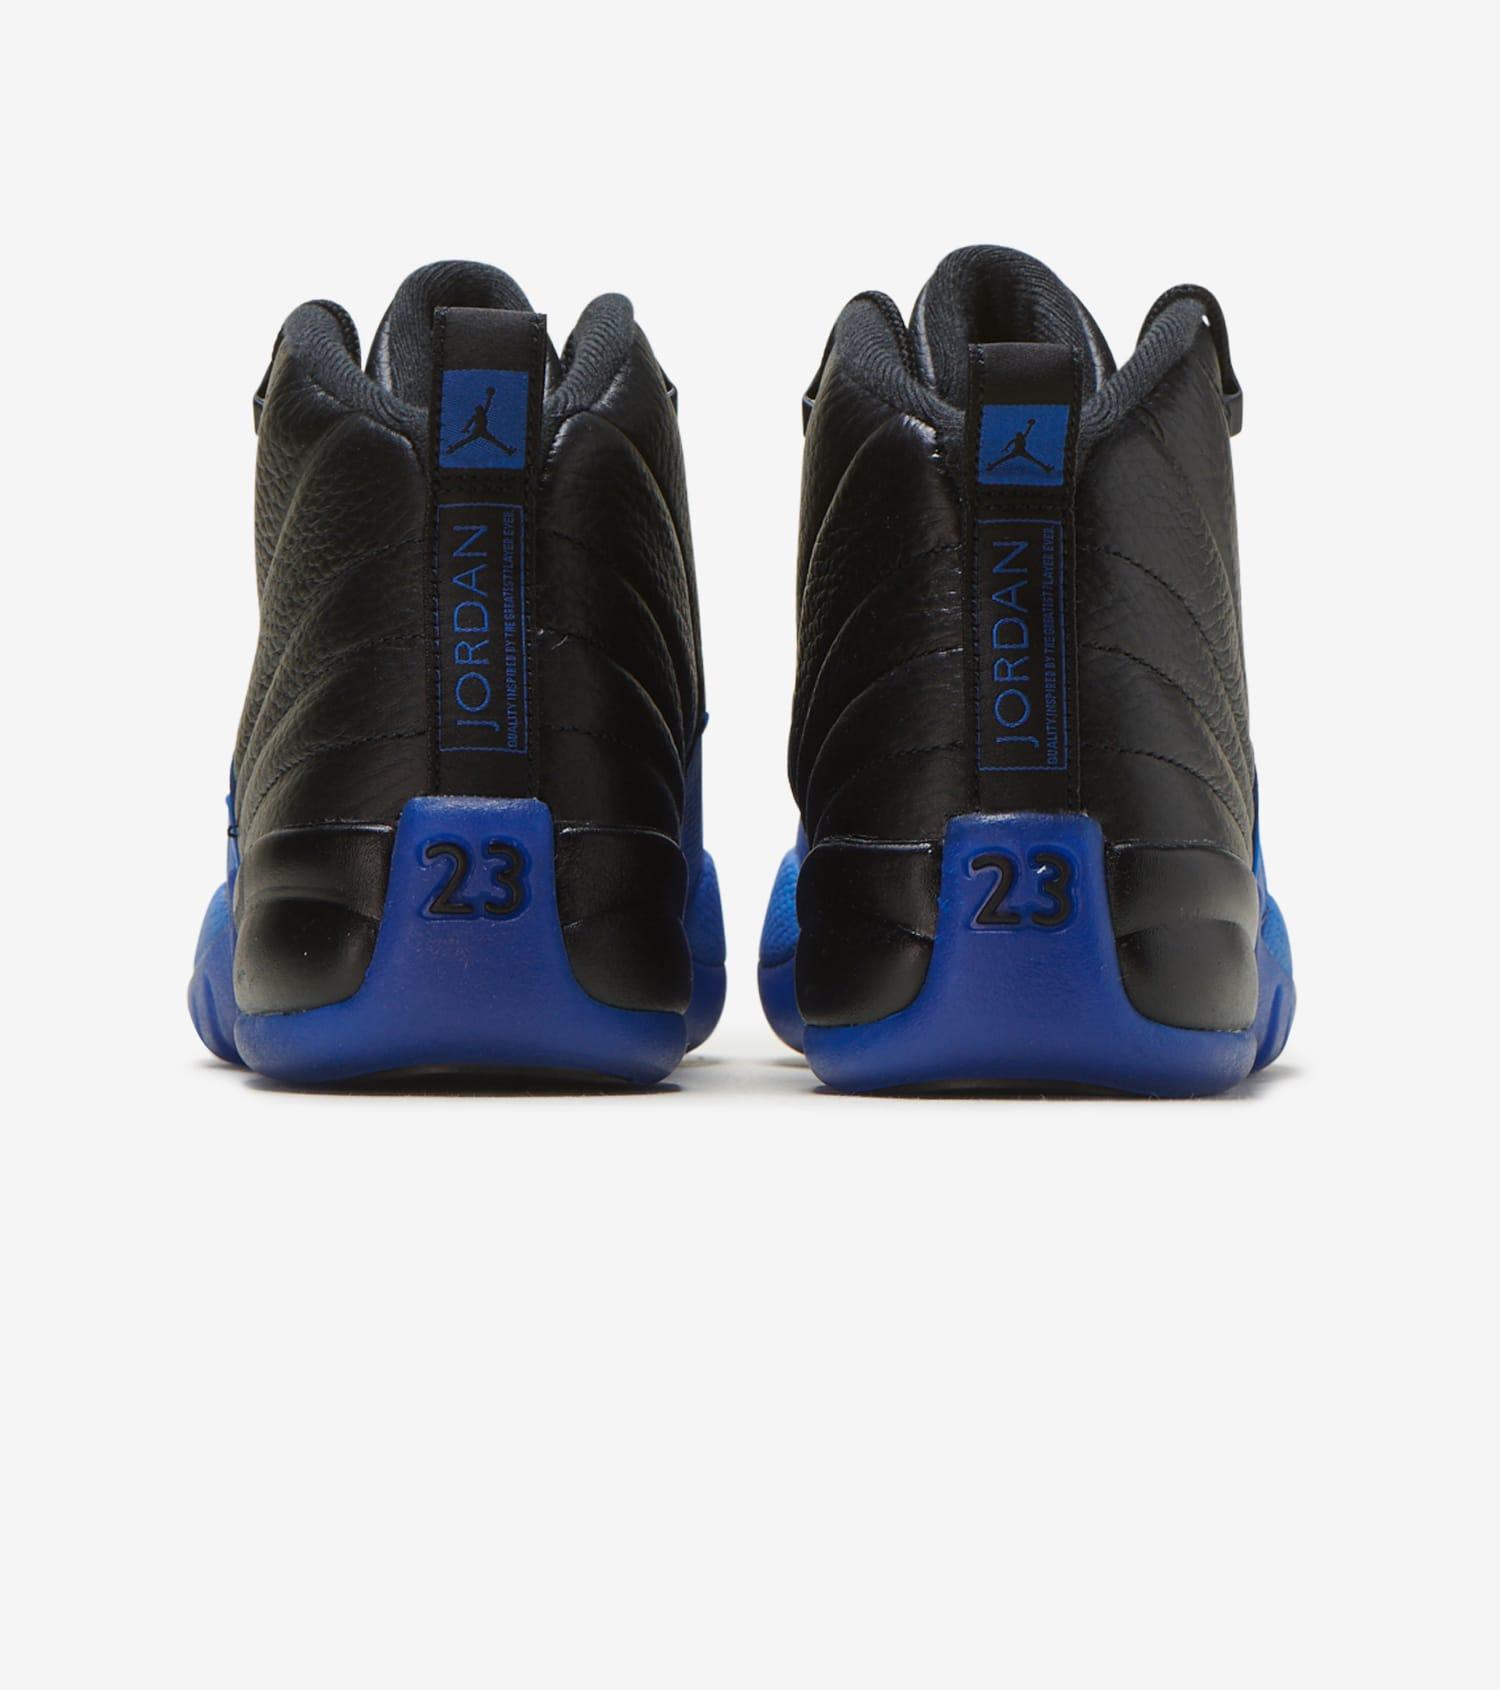 best sneakers a0c8a 8fb86 Air Jordan 12 Retro